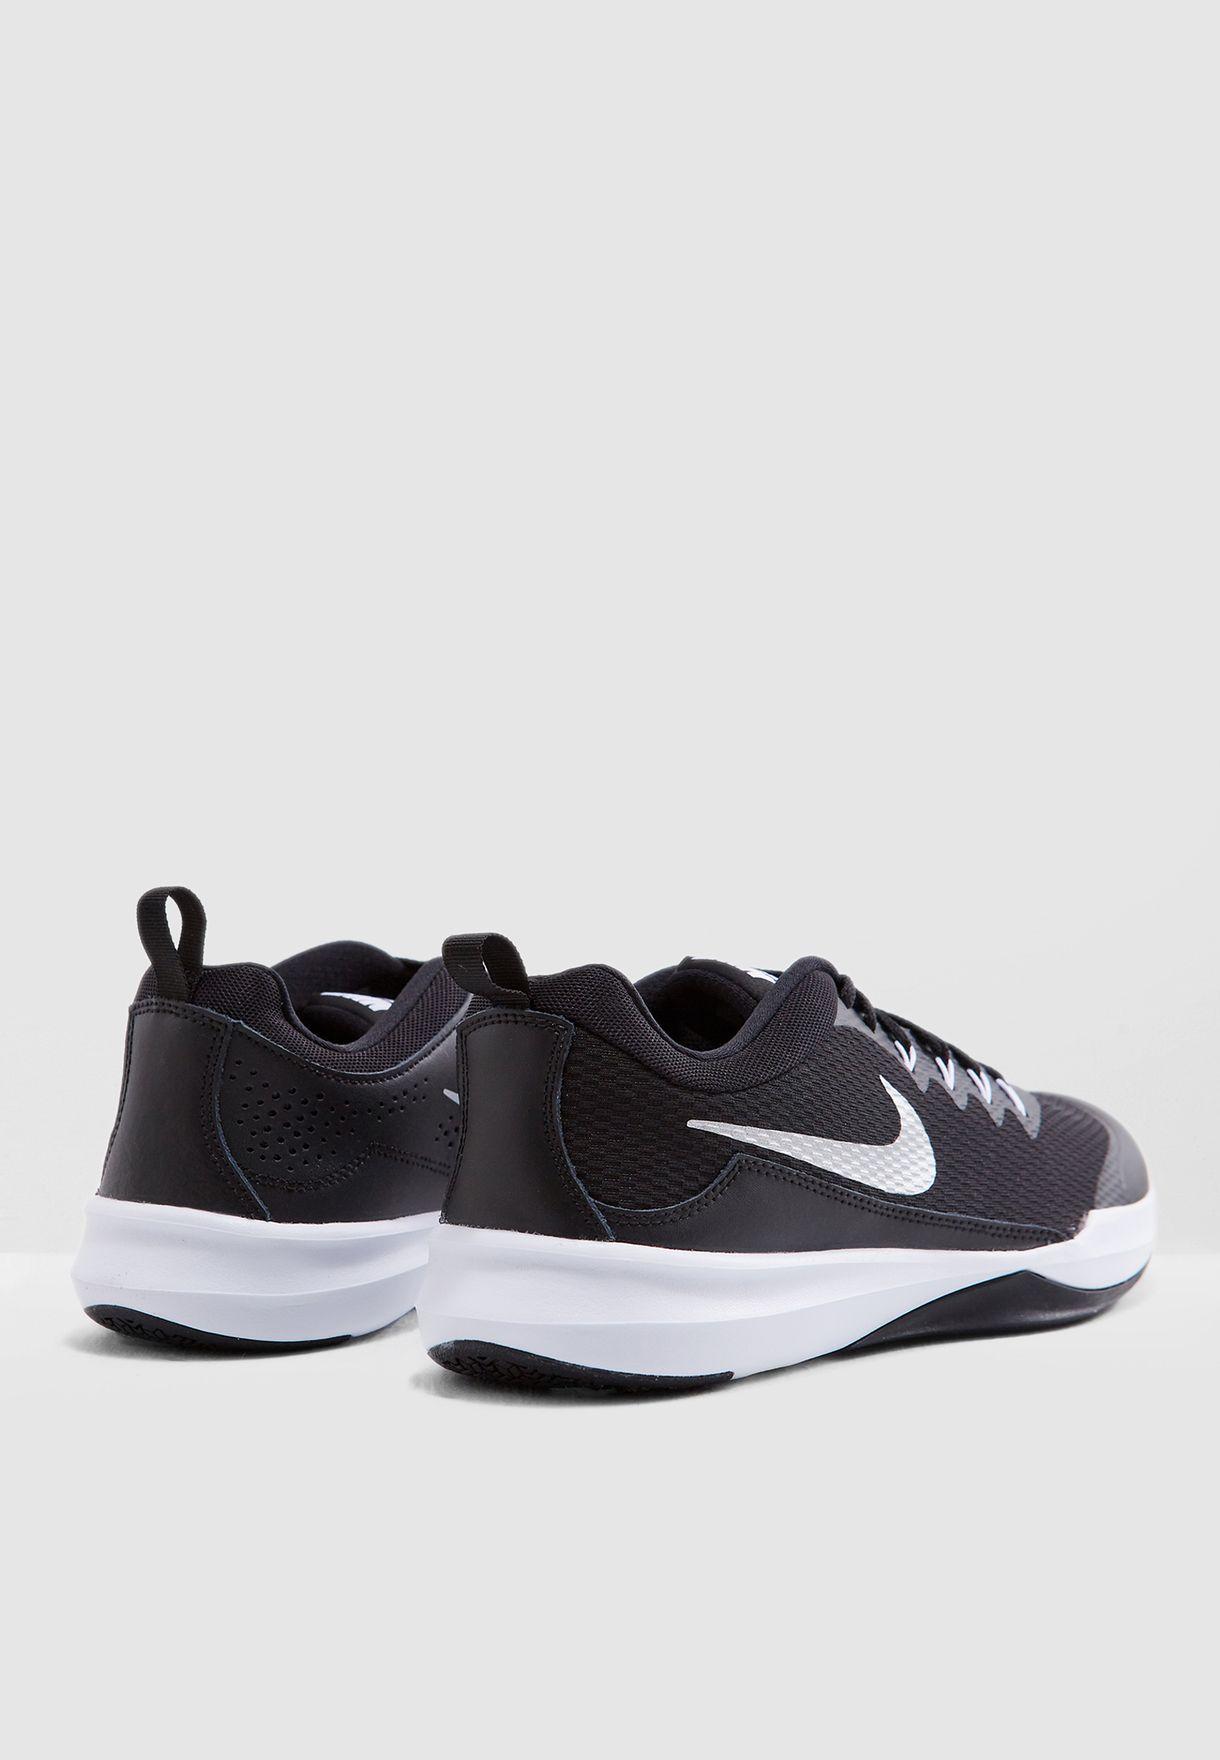 2180c4d4741 Shop Nike black Legend Trainer 924206-001 for Men in Qatar ...